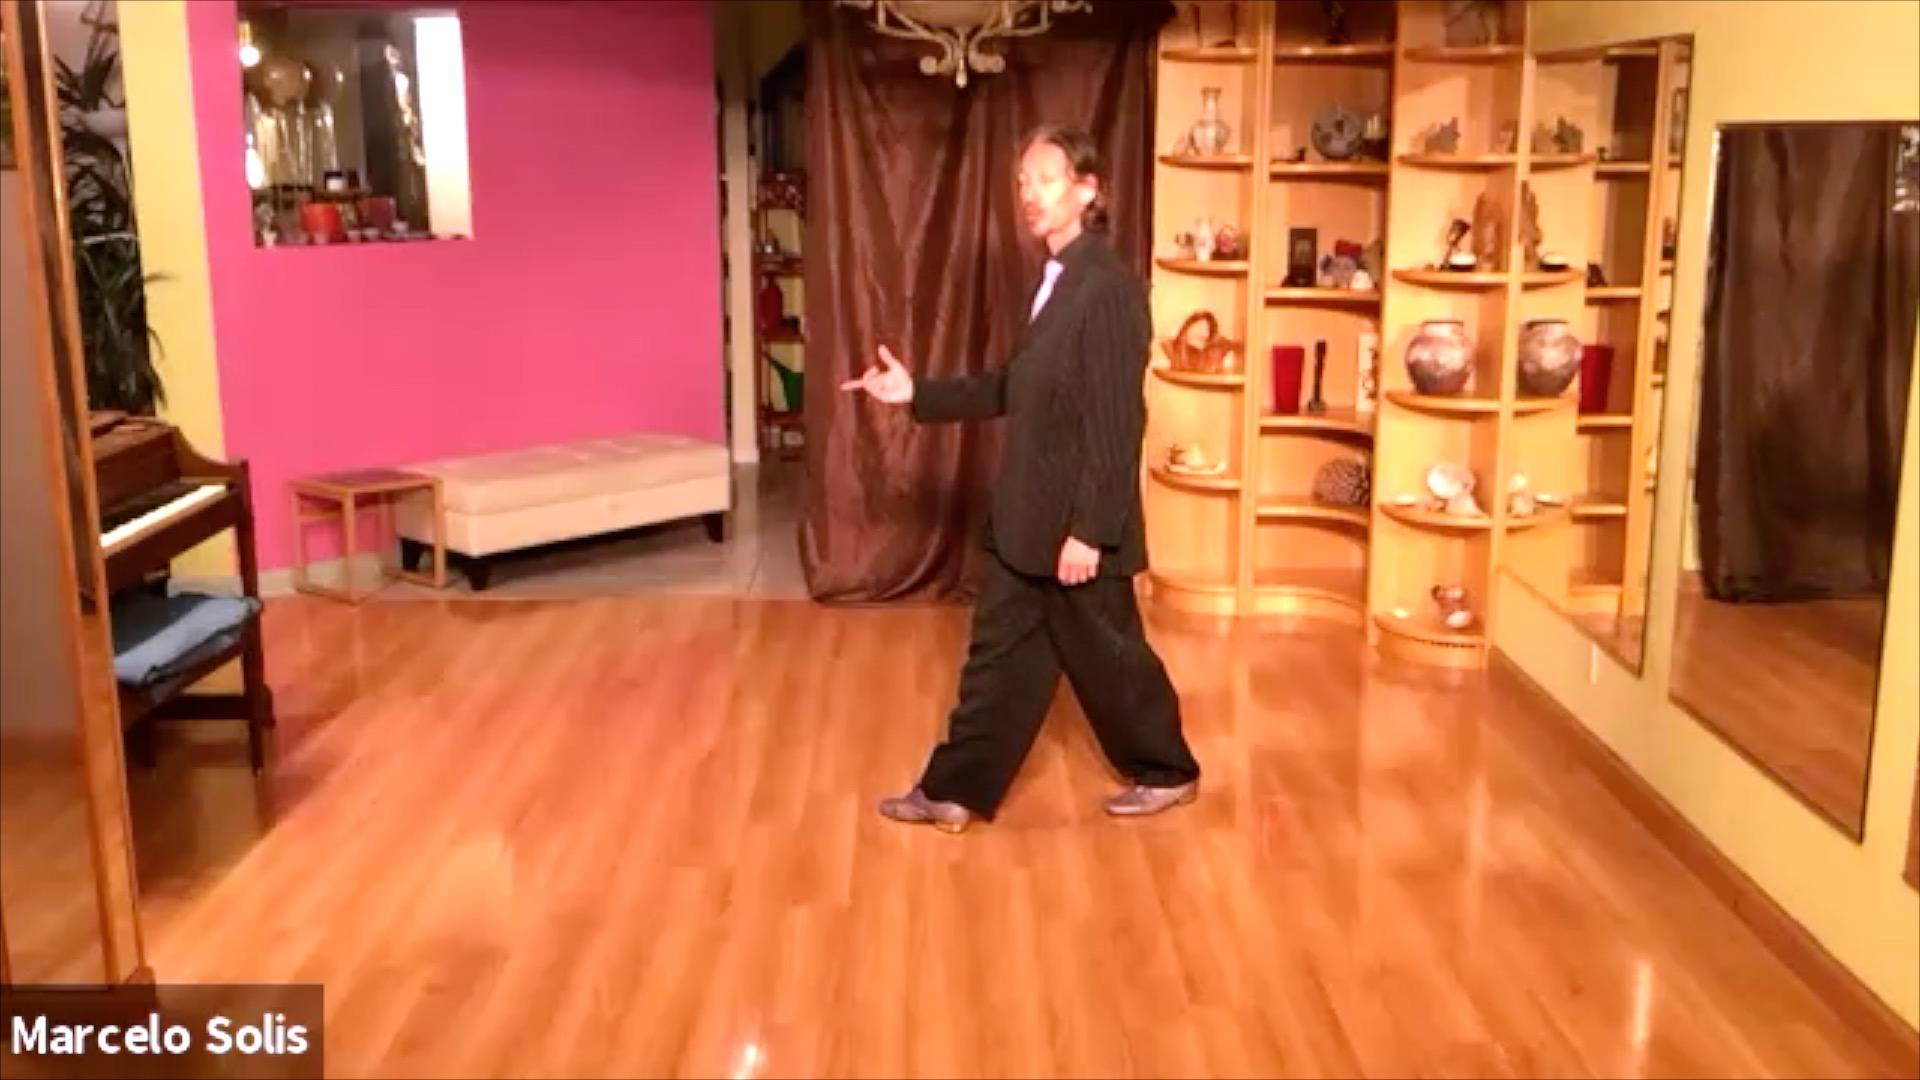 Argentine Tango class: sequence of backward ocho, backward-forward move, forward ocho cortado and forward ocho